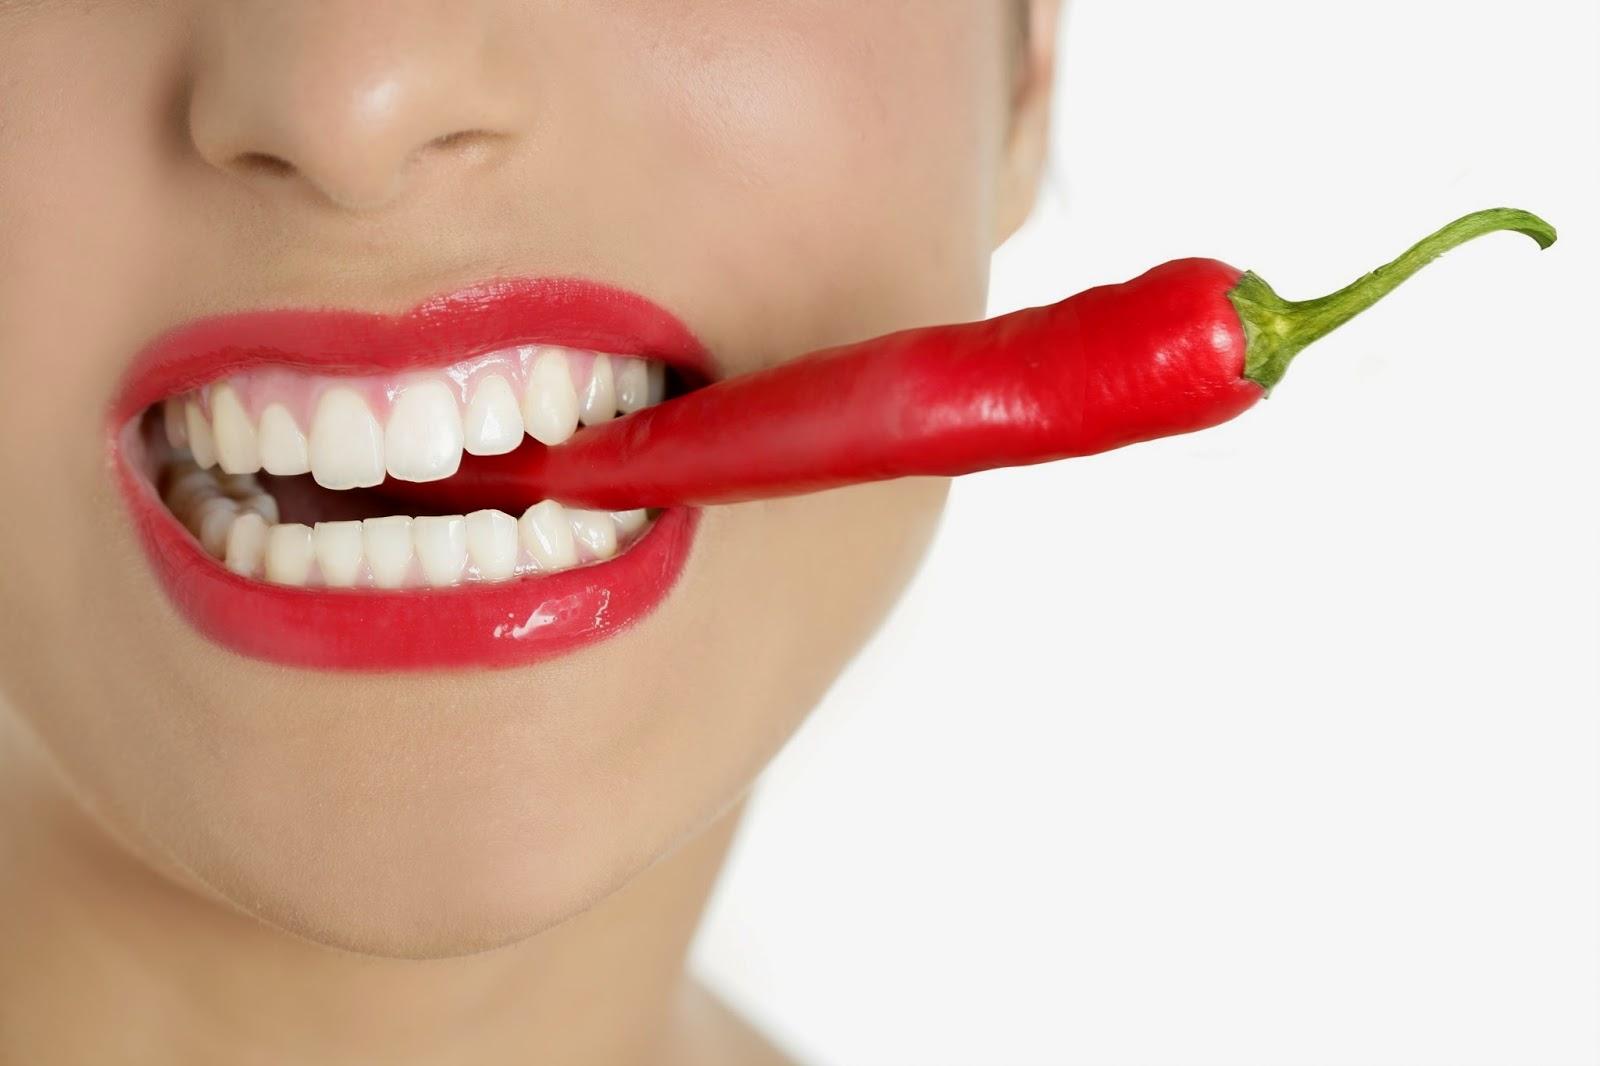 detodounpoco.achl Beautiful-woman-teeth-eating-1